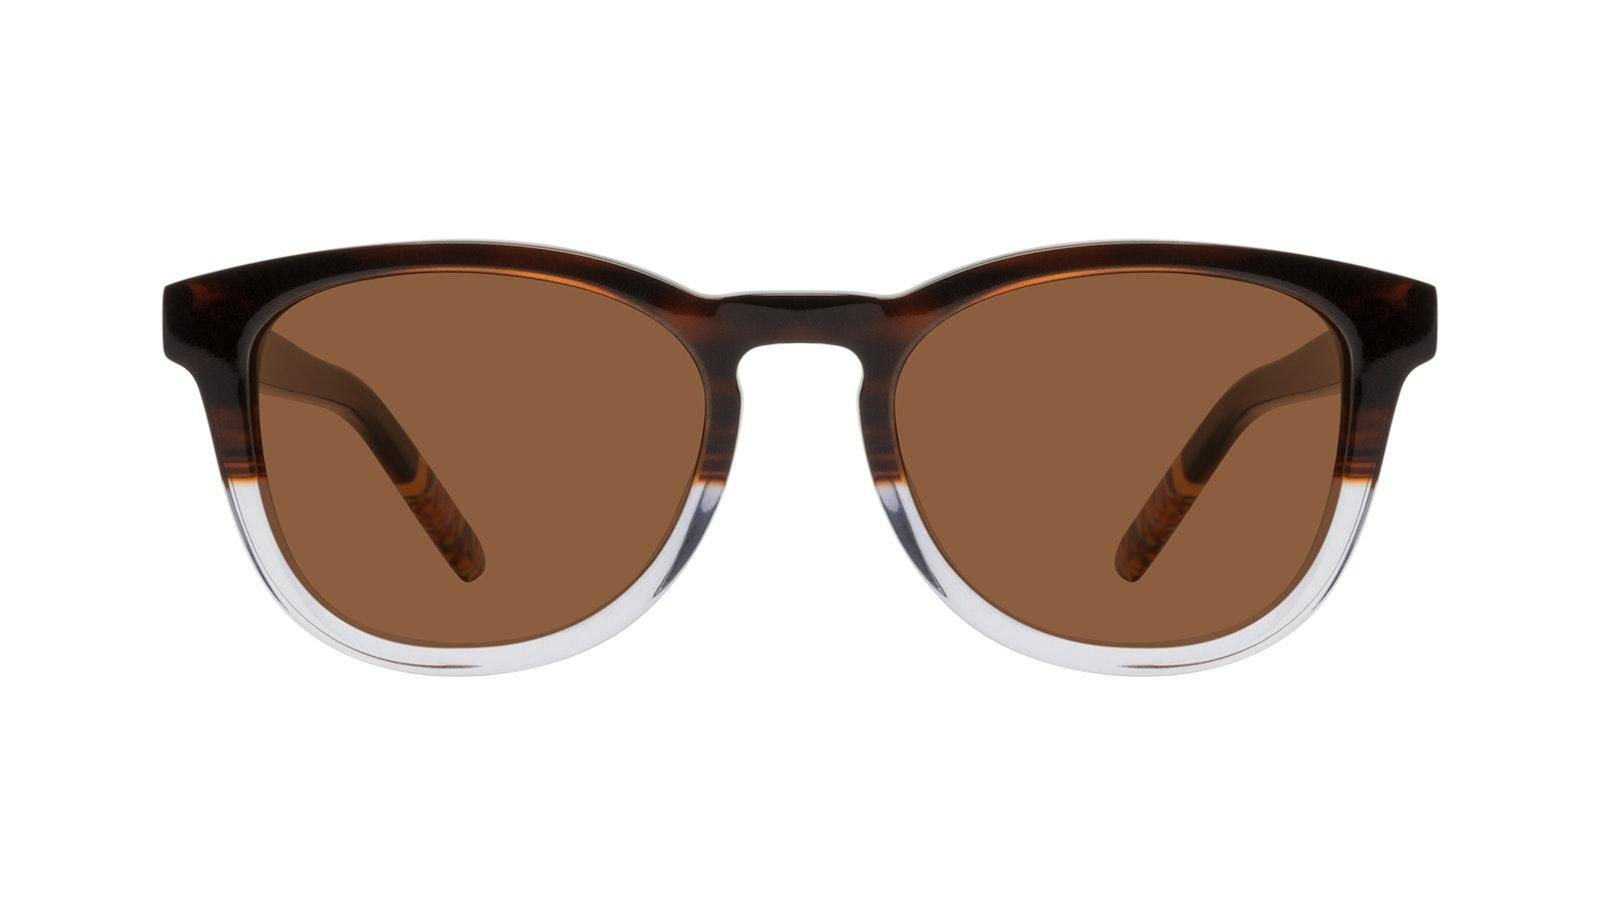 Affordable Fashion Glasses Round Sunglasses Men Goal Bark